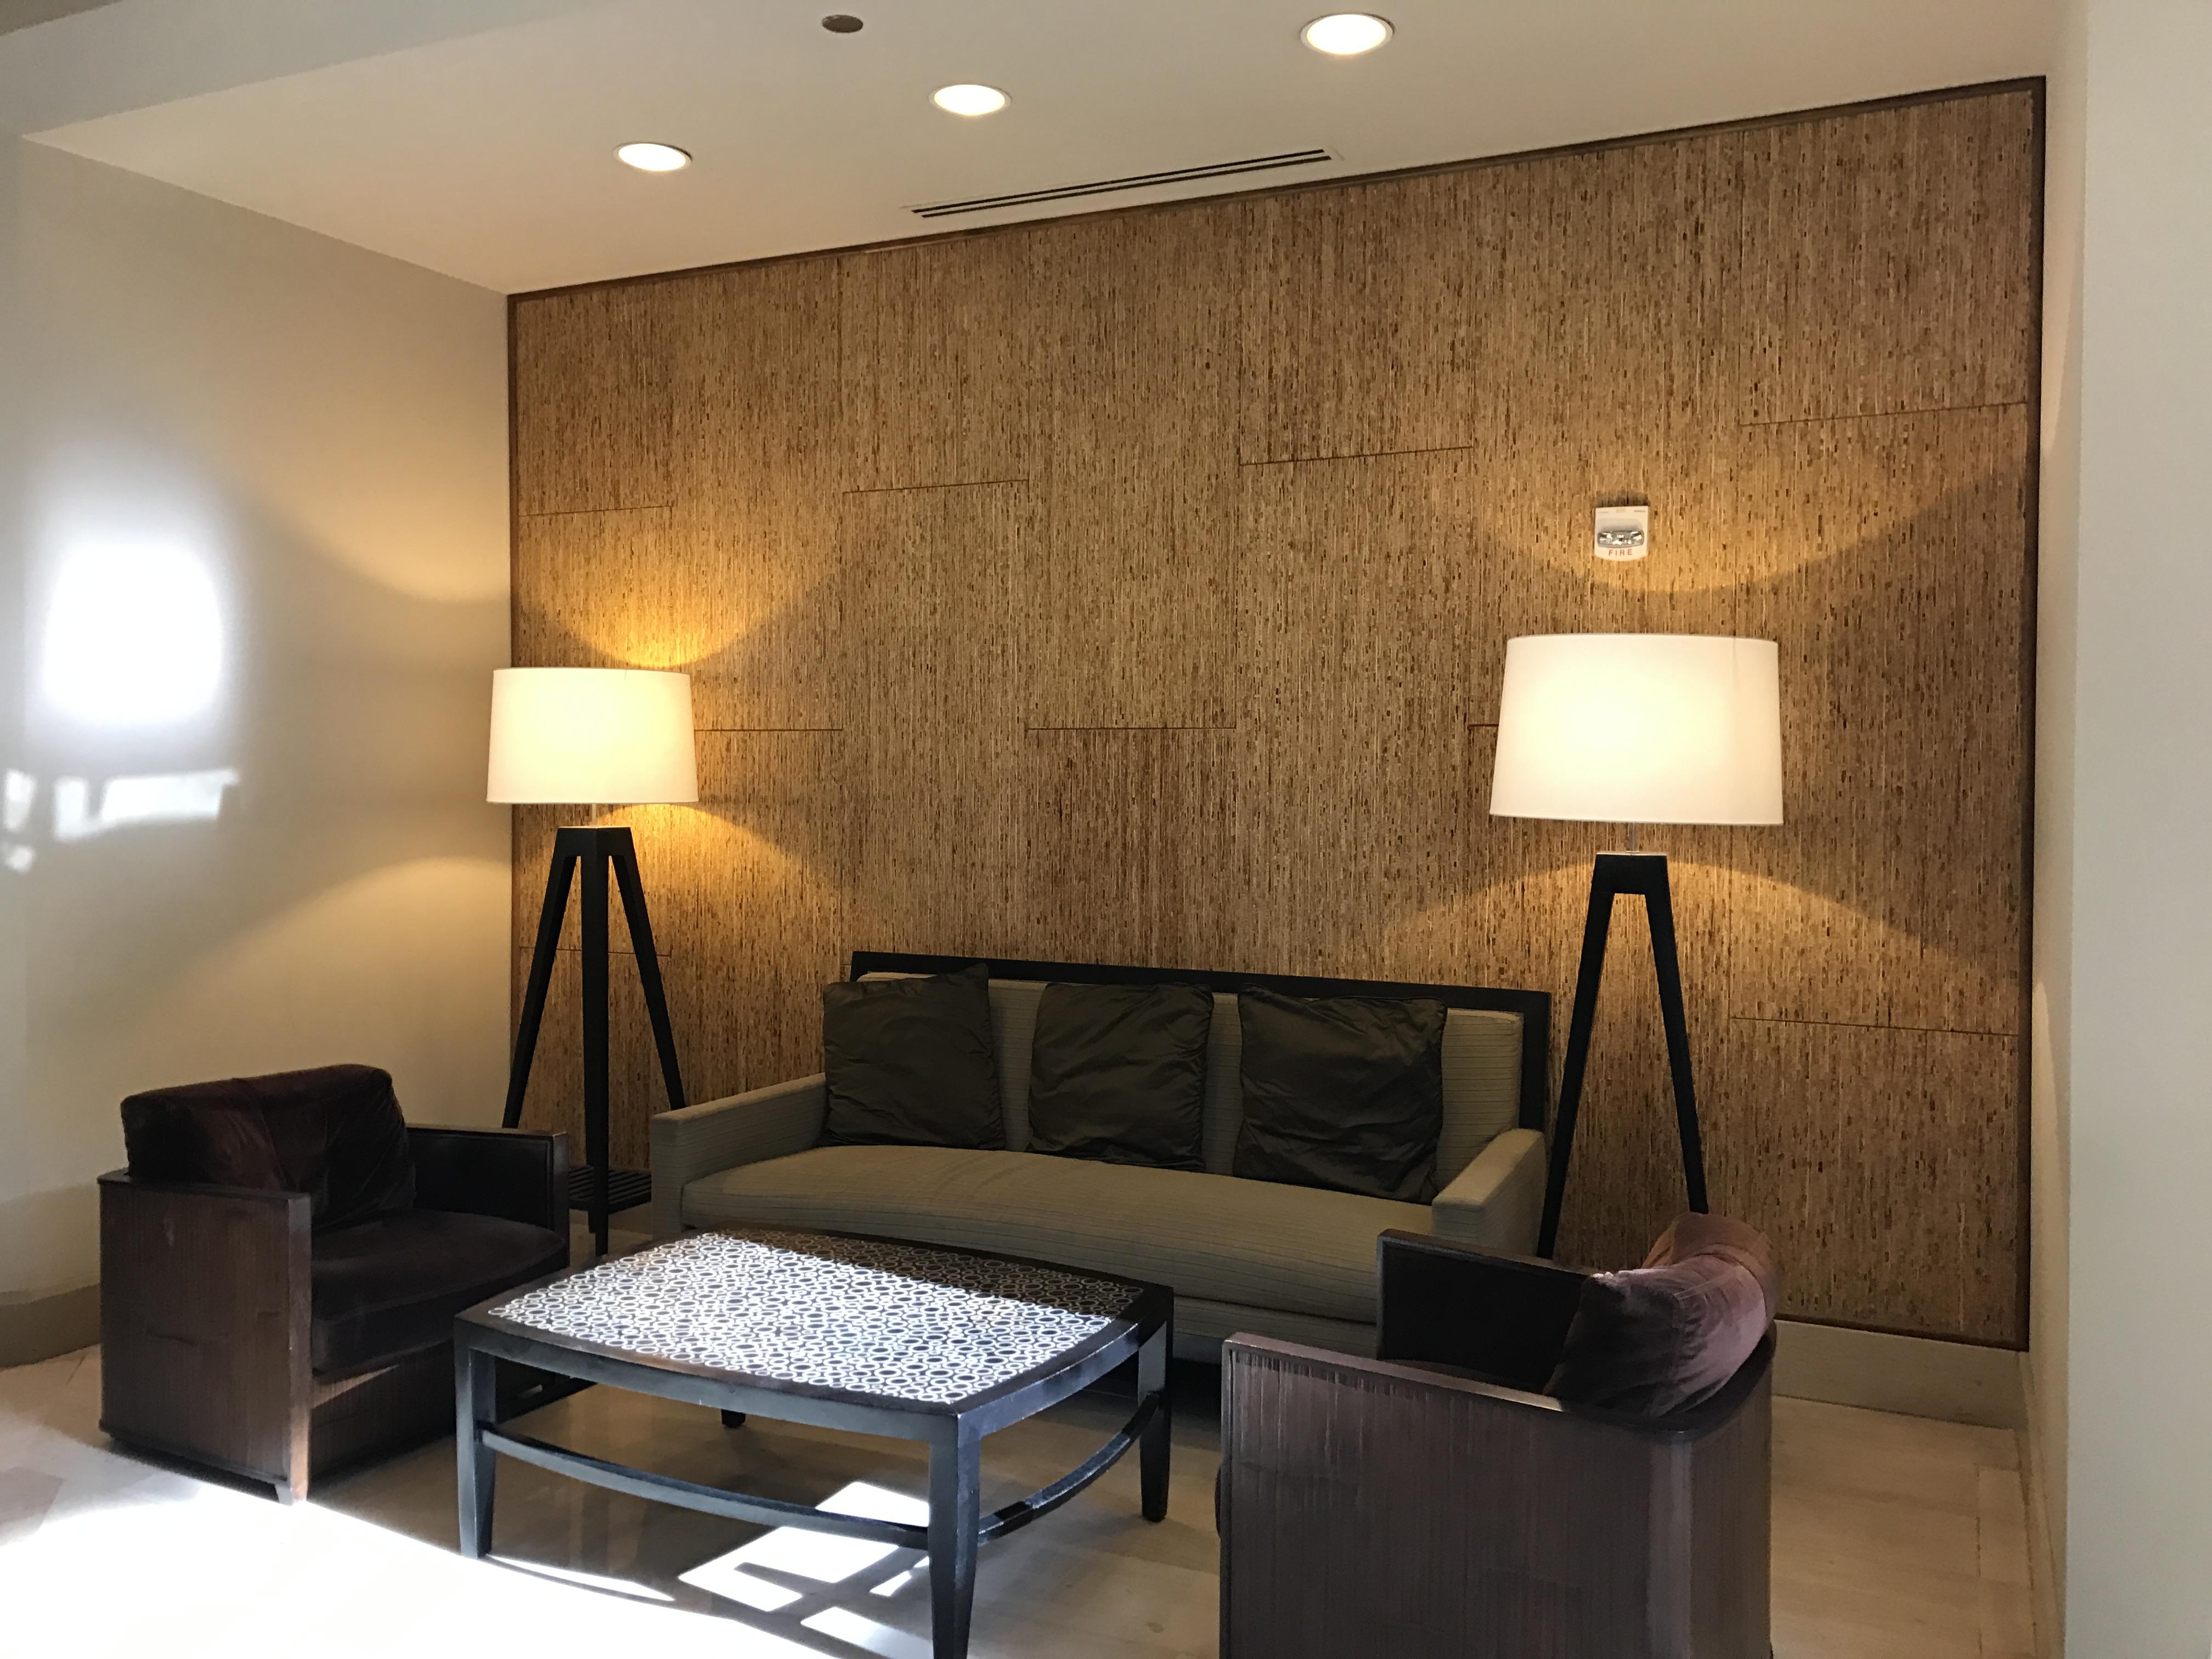 Kirei-Board-Wall-Hotel-Hospitality-Lobby-Hyatt-Regency-Orlando-5